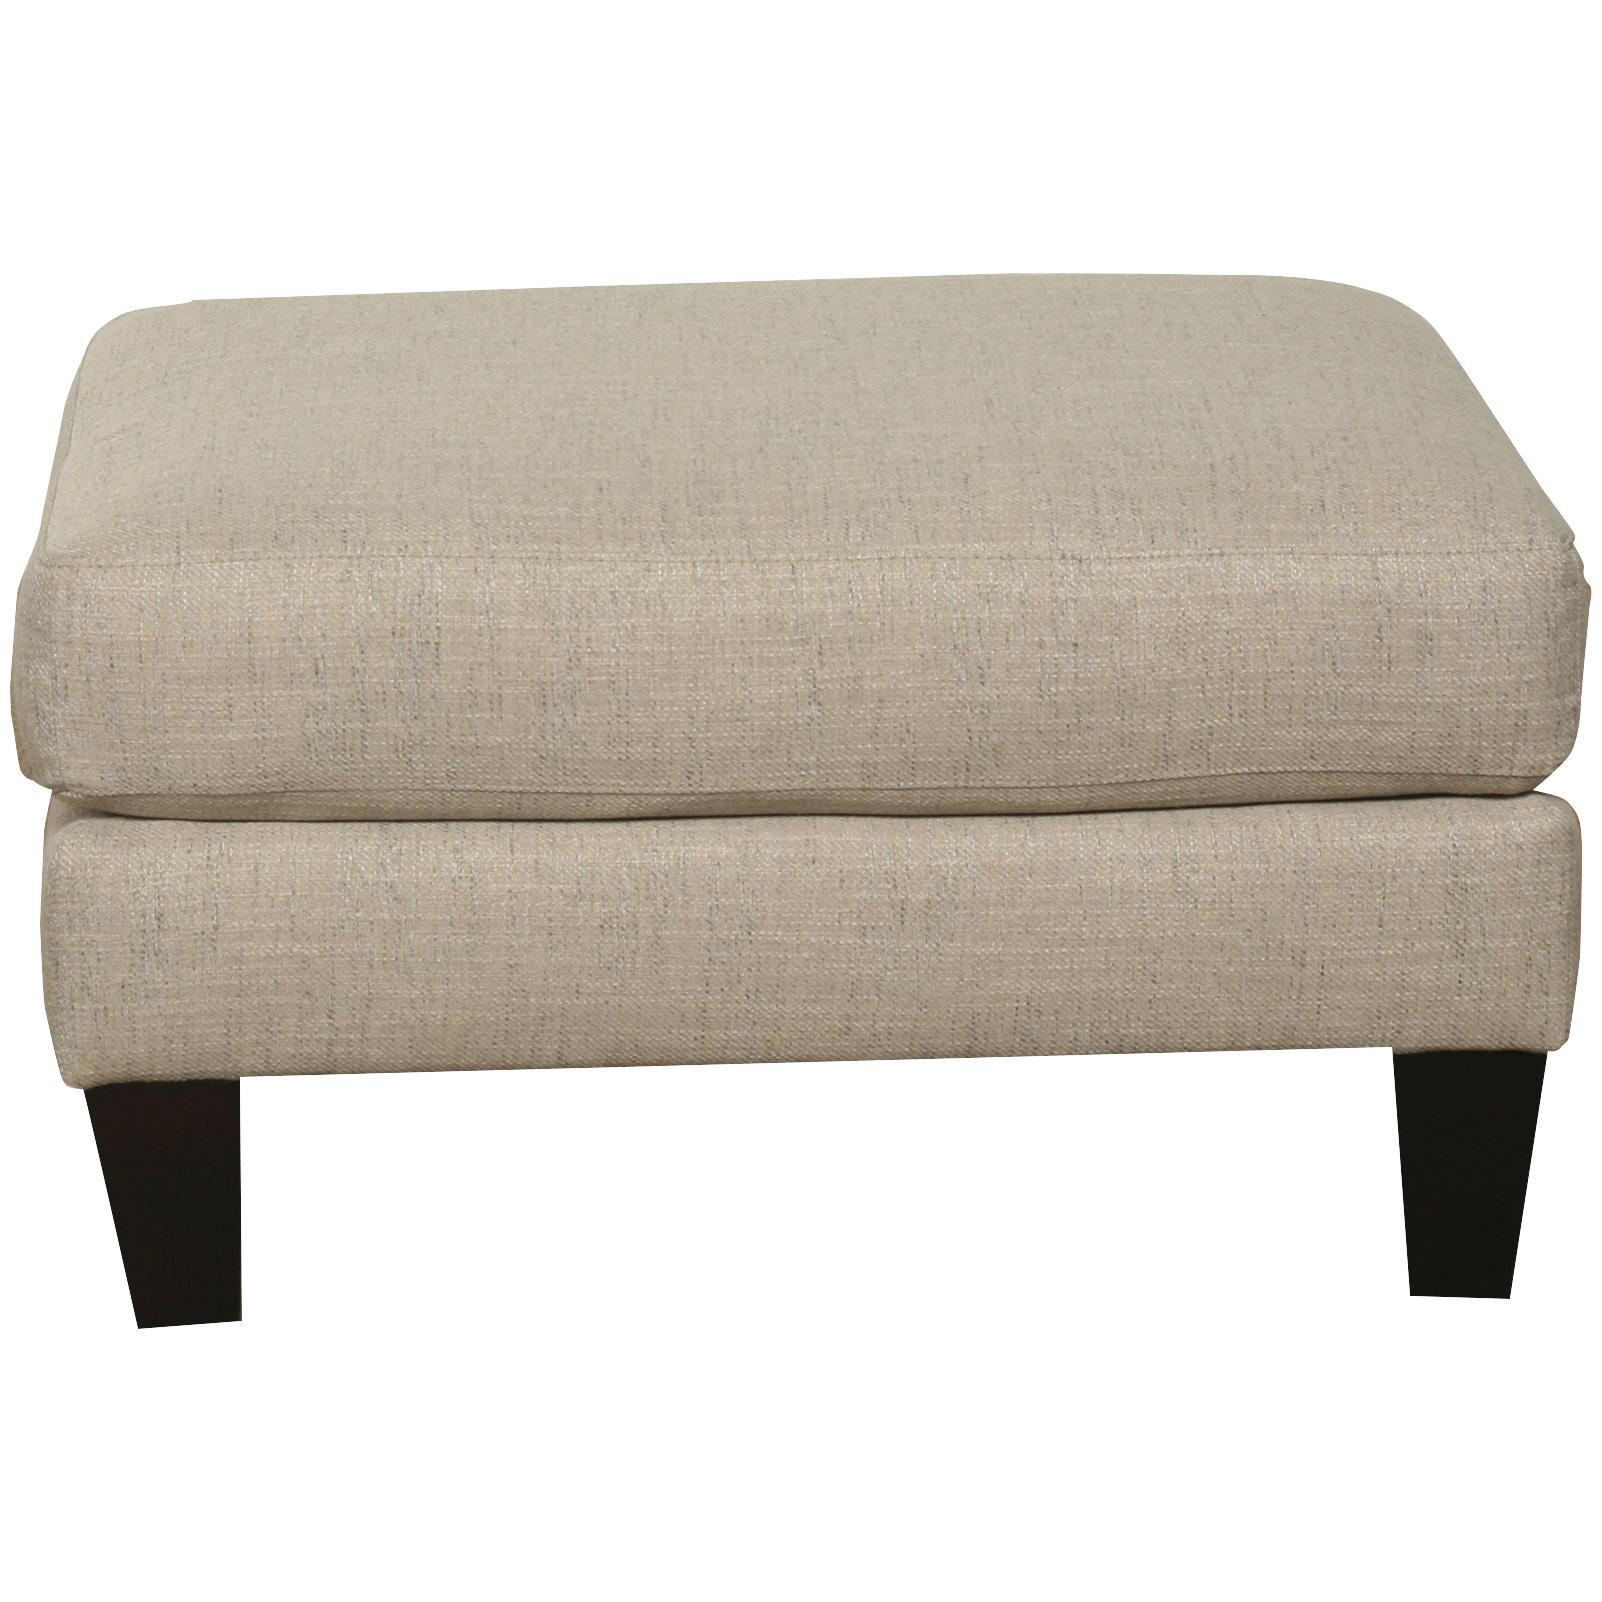 Bauhaus Furniture | Solo Burlap Ottoman